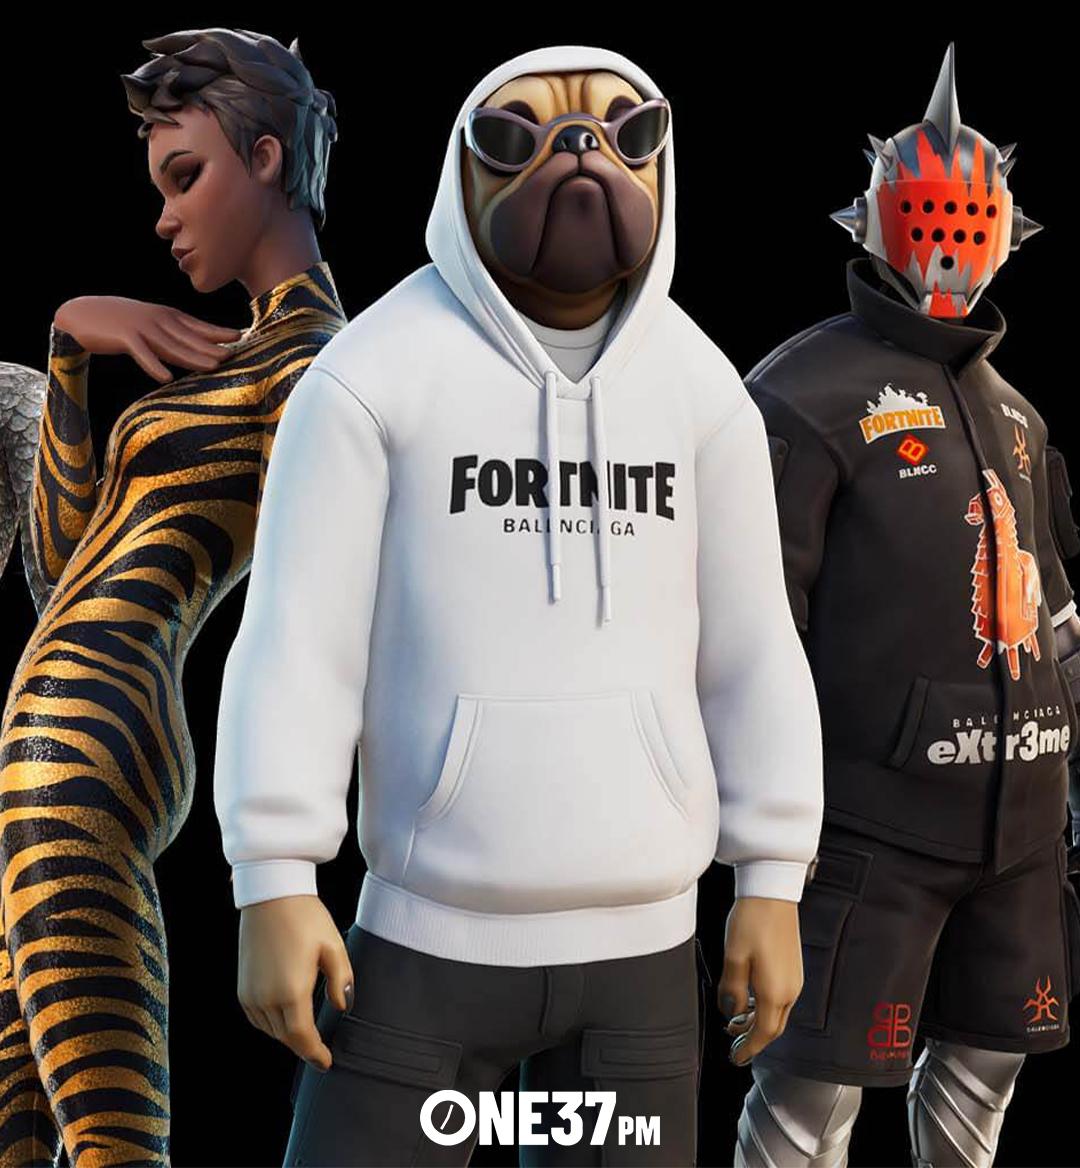 fortnite balenciaga fashion gaming mobile